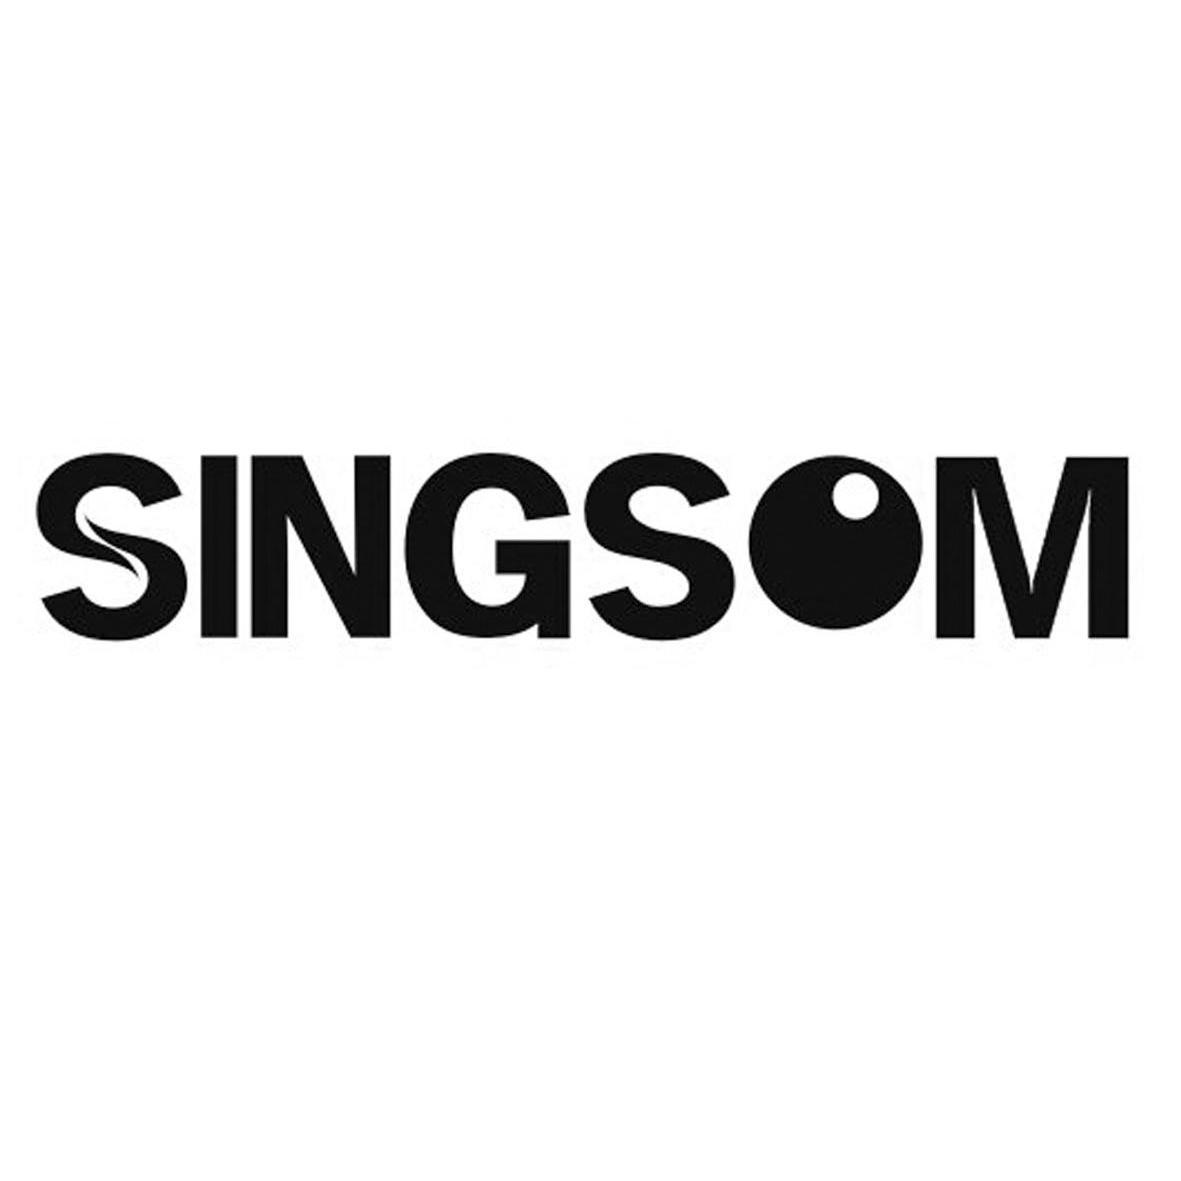 SINGSOM商标转让